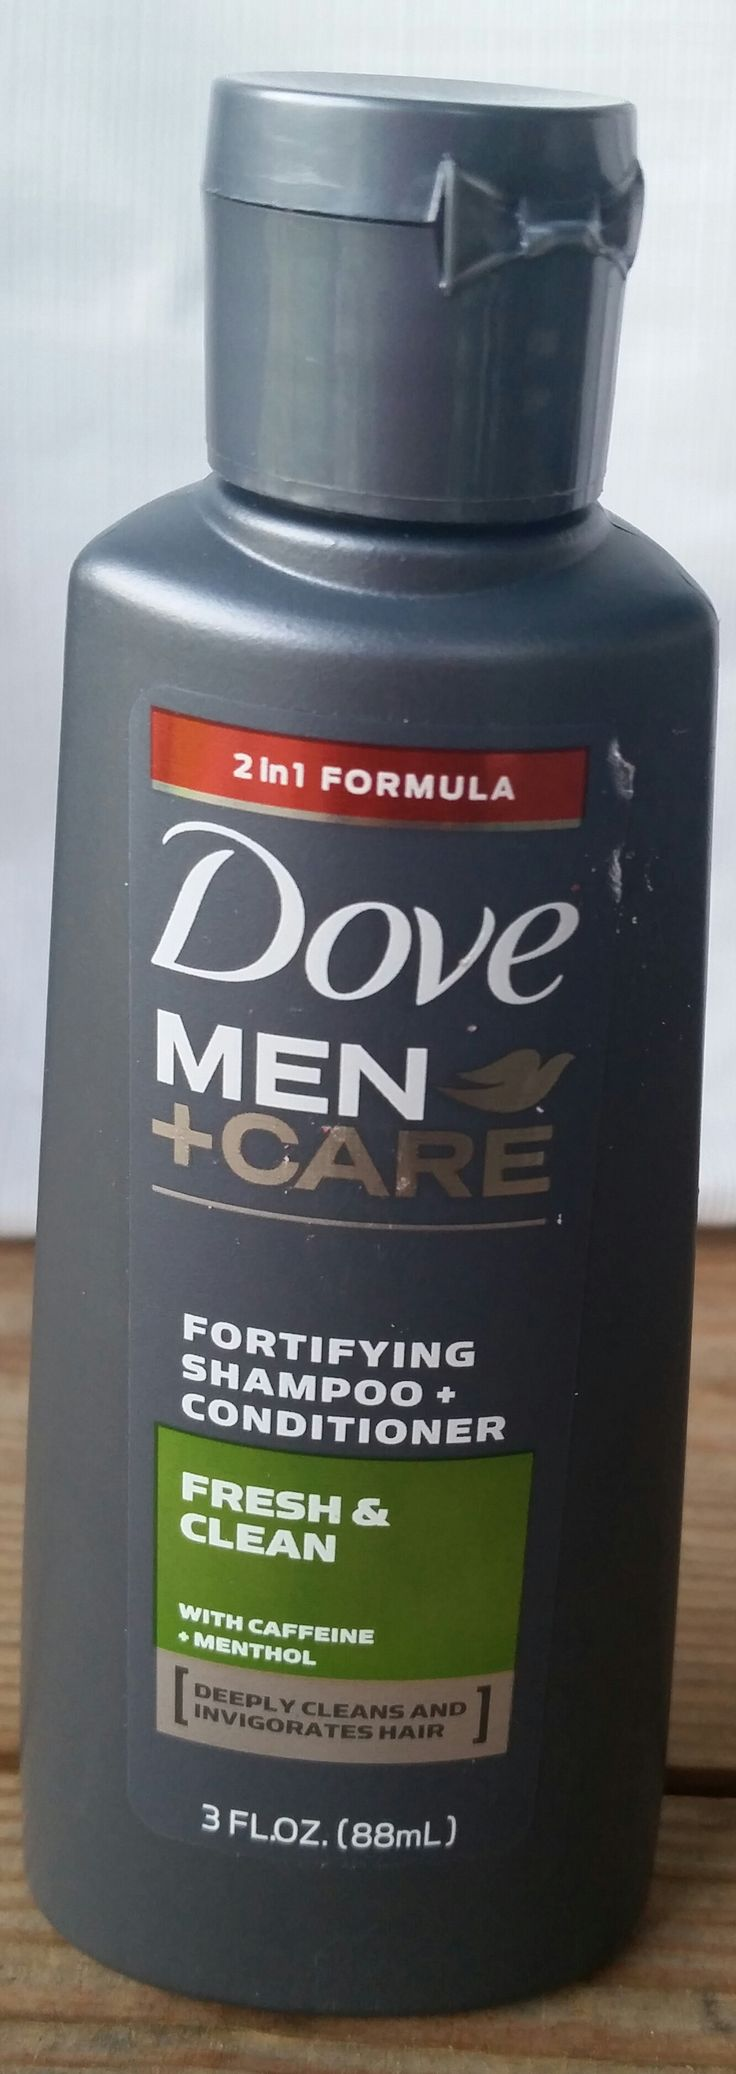 men's dove hair shampoo and conditioner